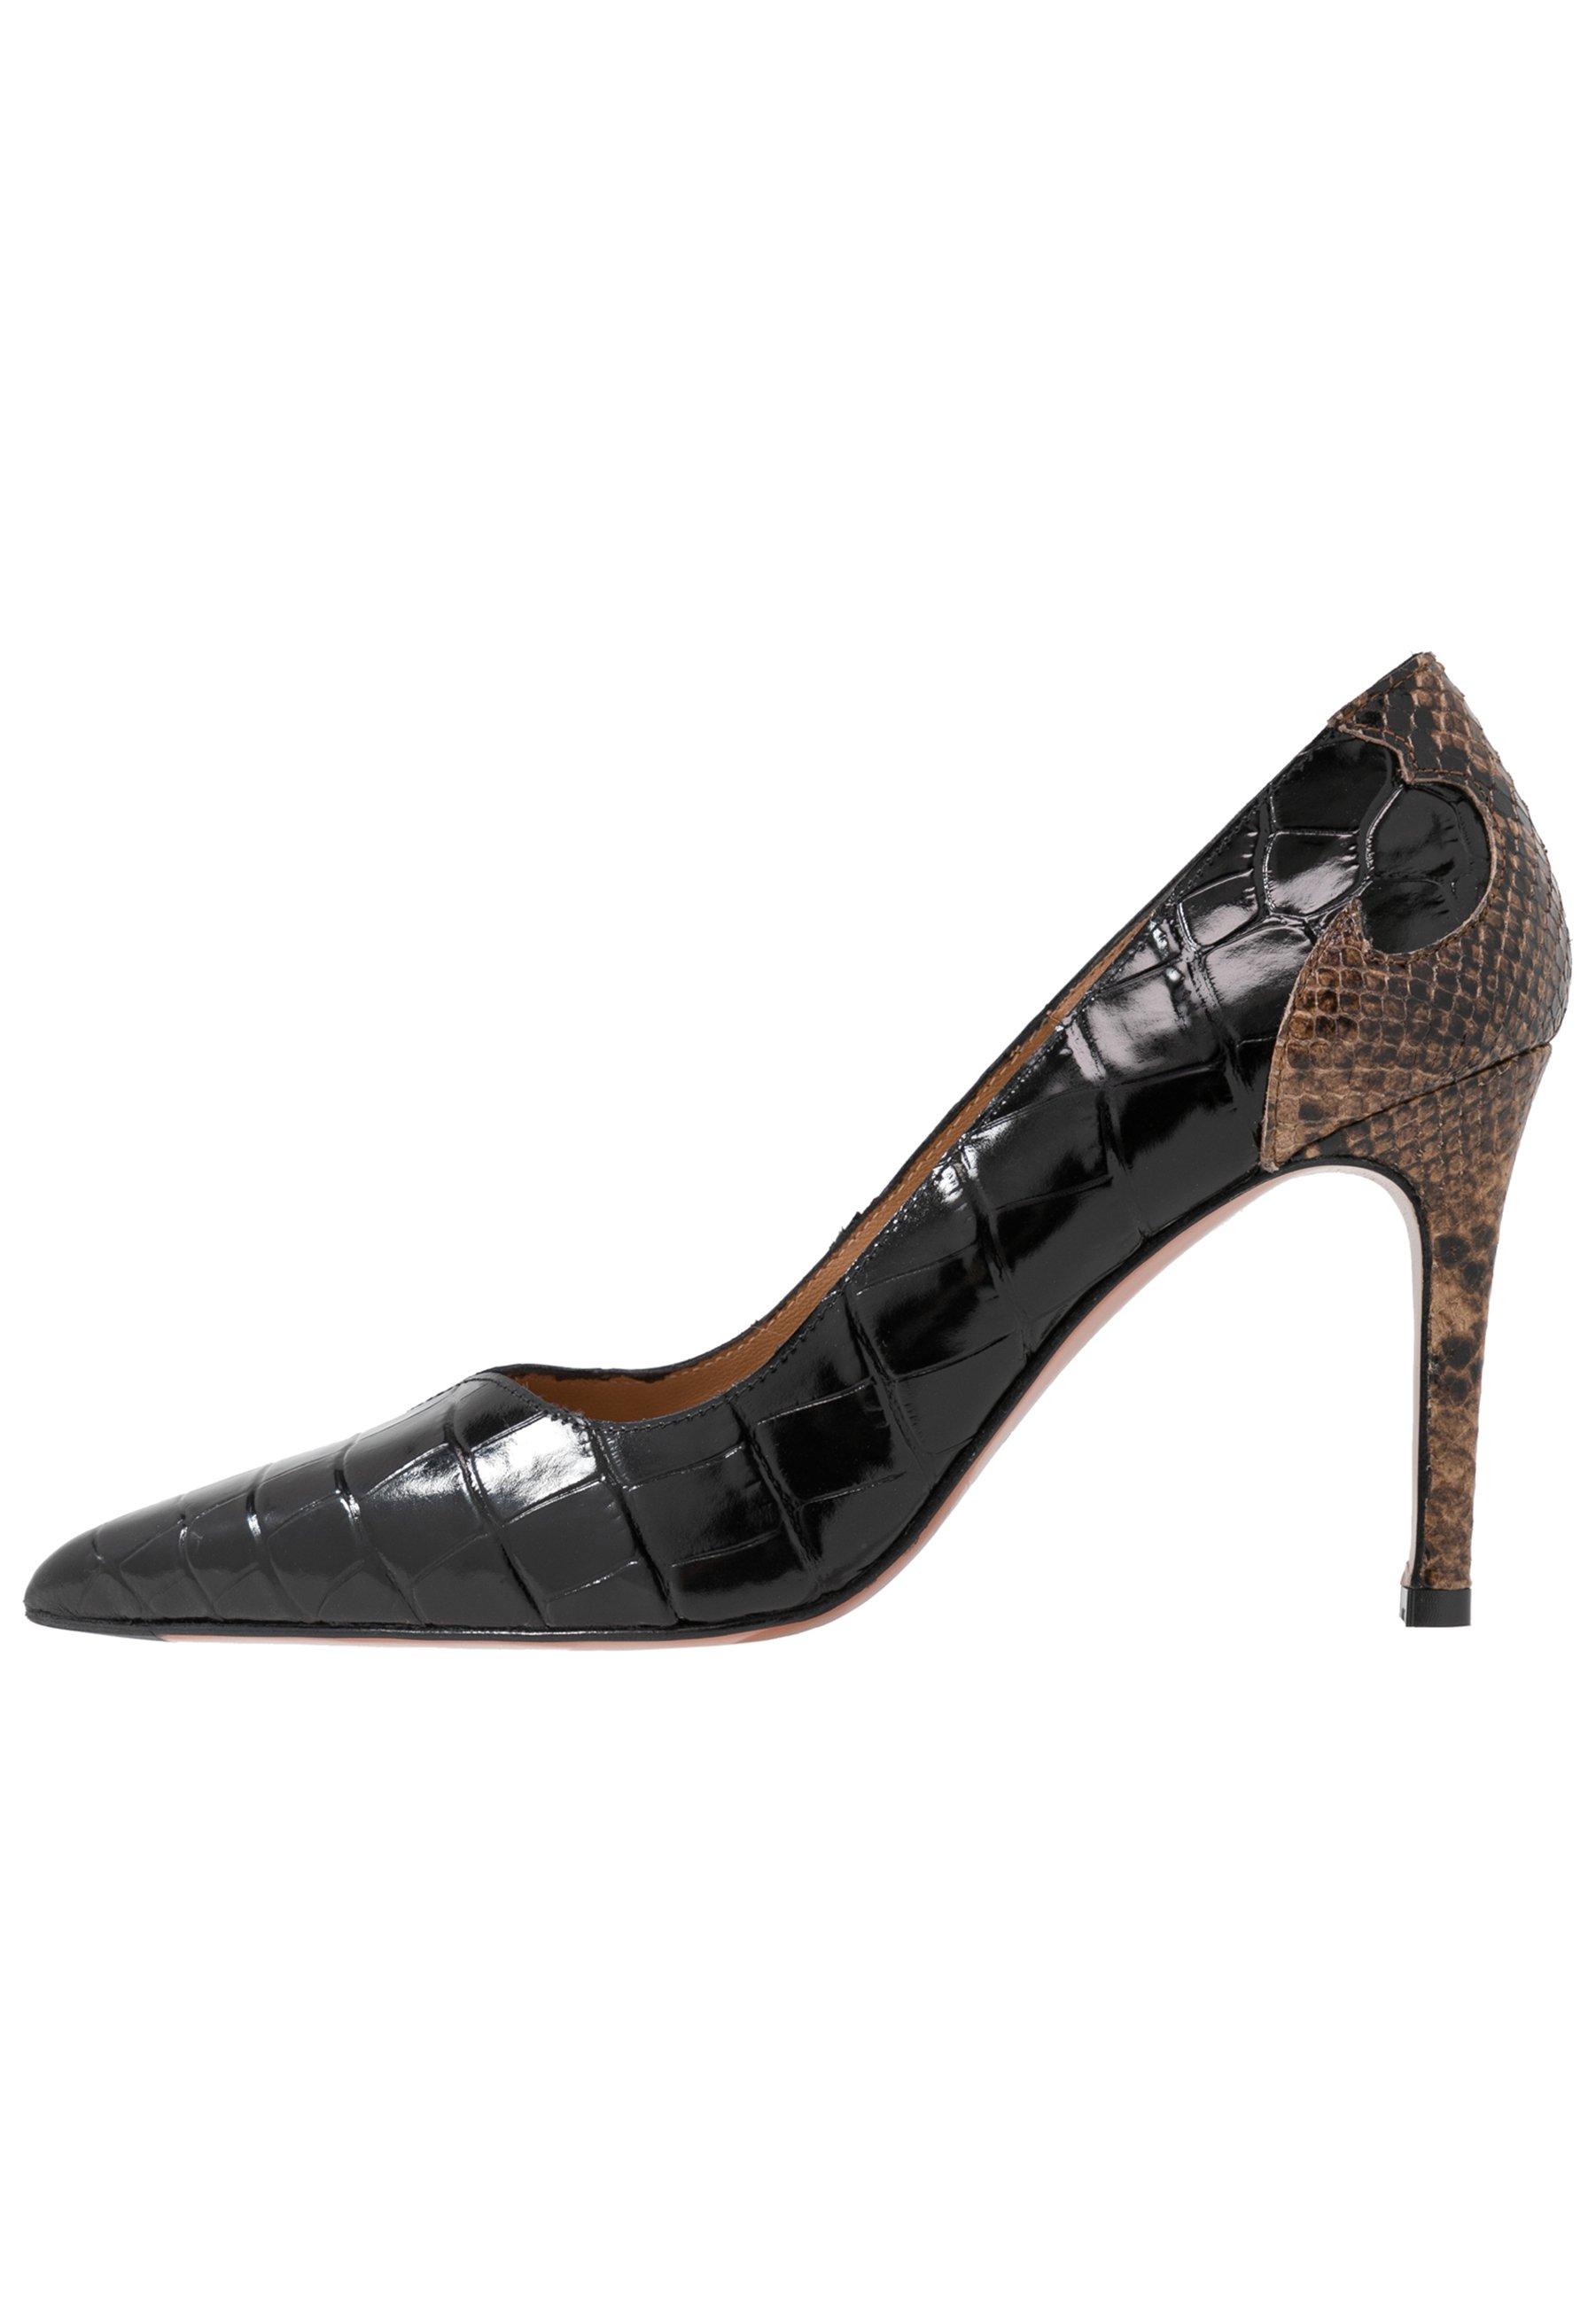 Toral High Heel Pumps - Gold/oro Black Friday